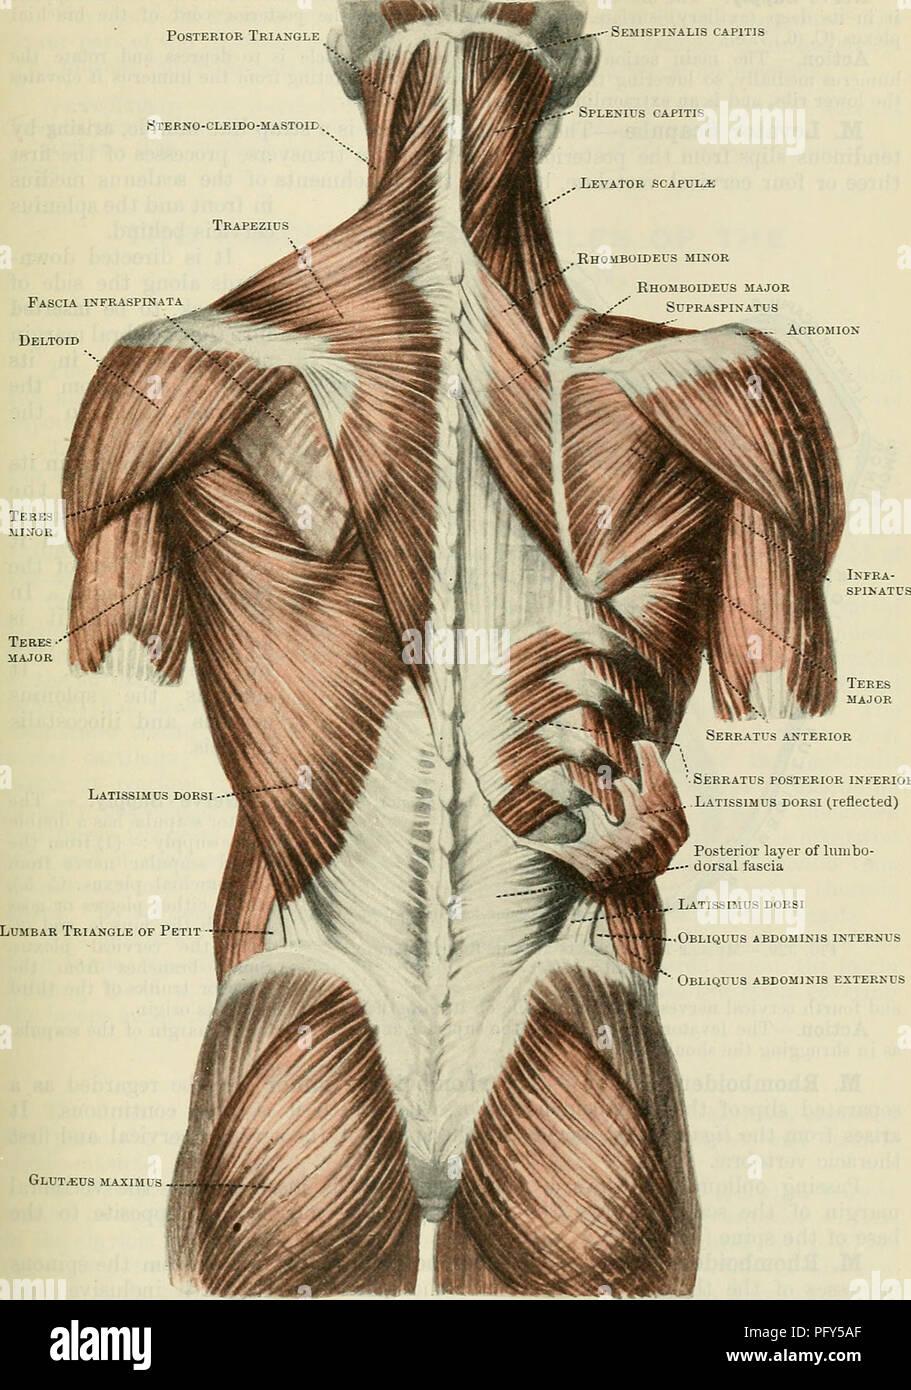 Latissimus Dorsi Anatomy Muscles Stock Photos & Latissimus Dorsi ...